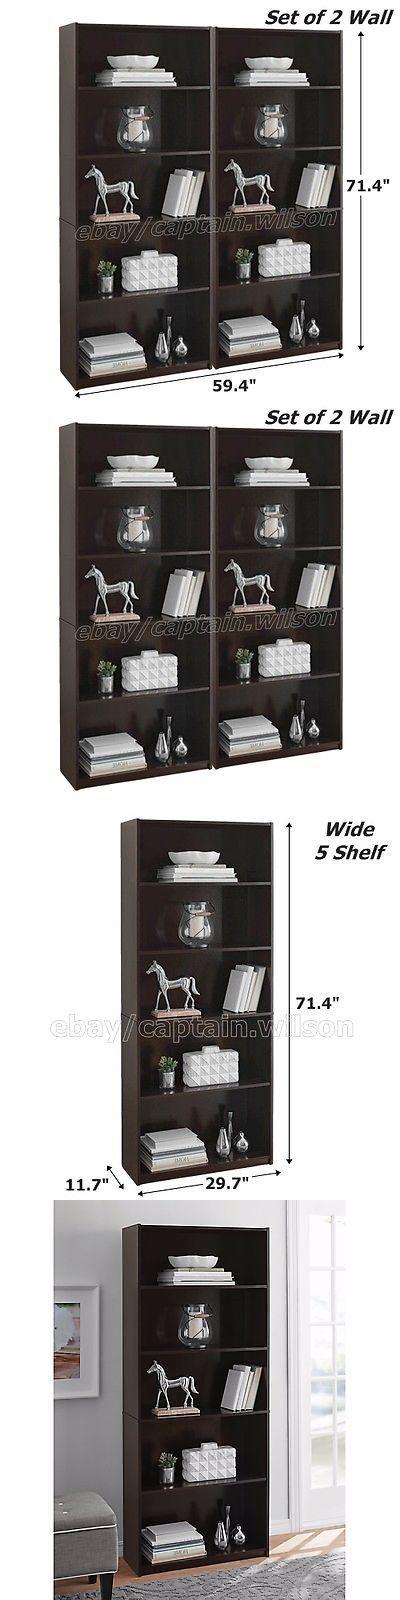 Bookcases 3199 Bookcase Wide 5 Shelf Set Of 2 Pcs Black Brown Espresso Adjule Bookshelf It Now Only 69 91 On Ebay